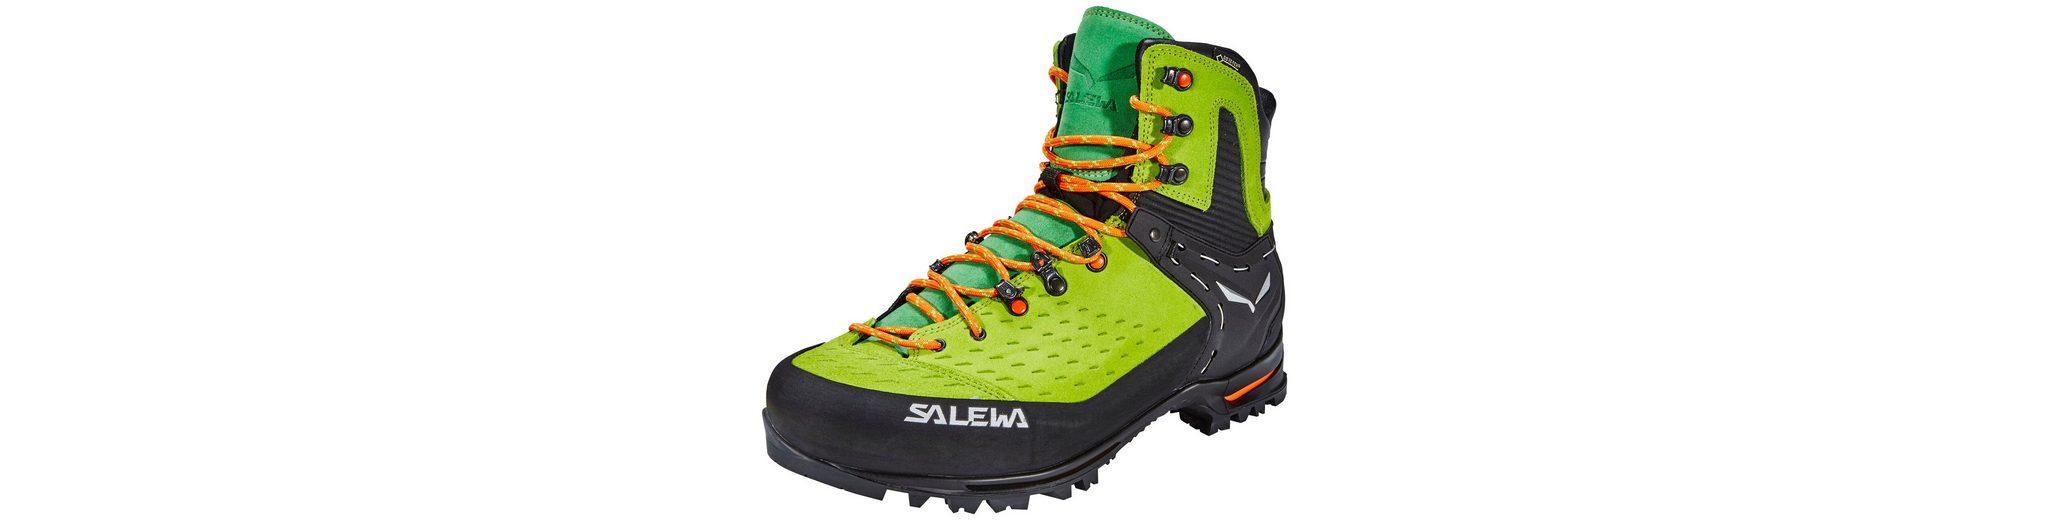 Salewa Kletterschuh Vultur GTX Alpine Shoes Unisex